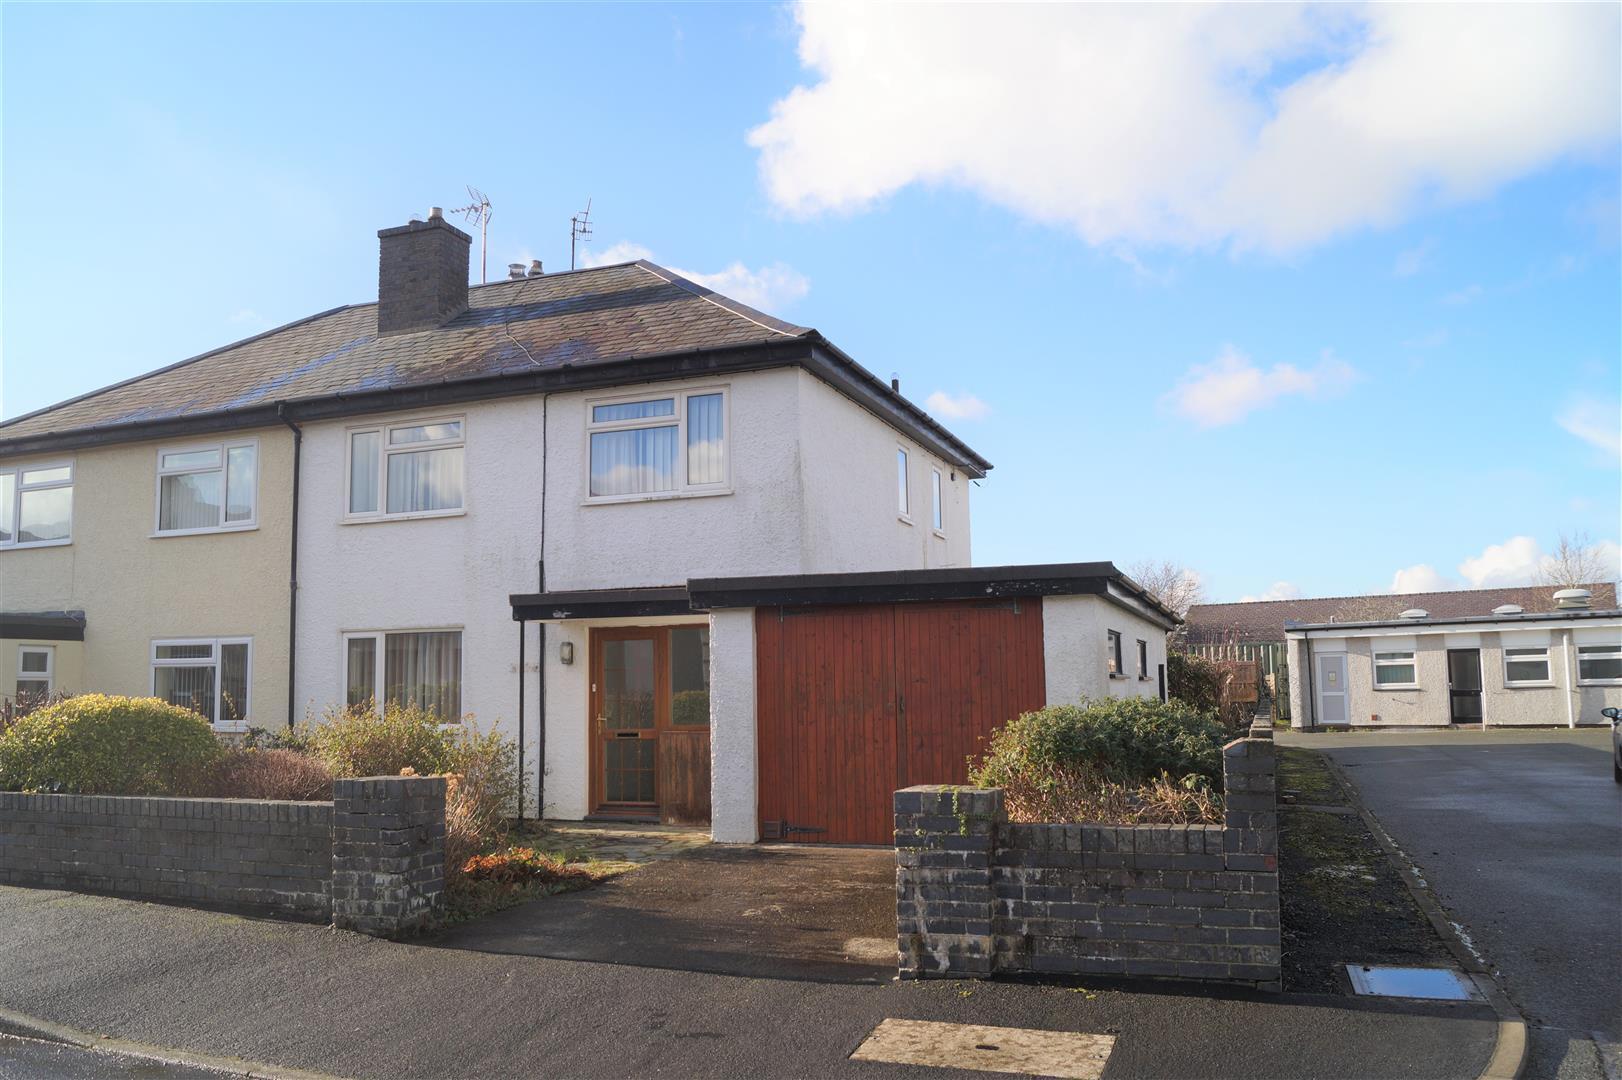 Manor Avenue, Pwllheli - £189,000